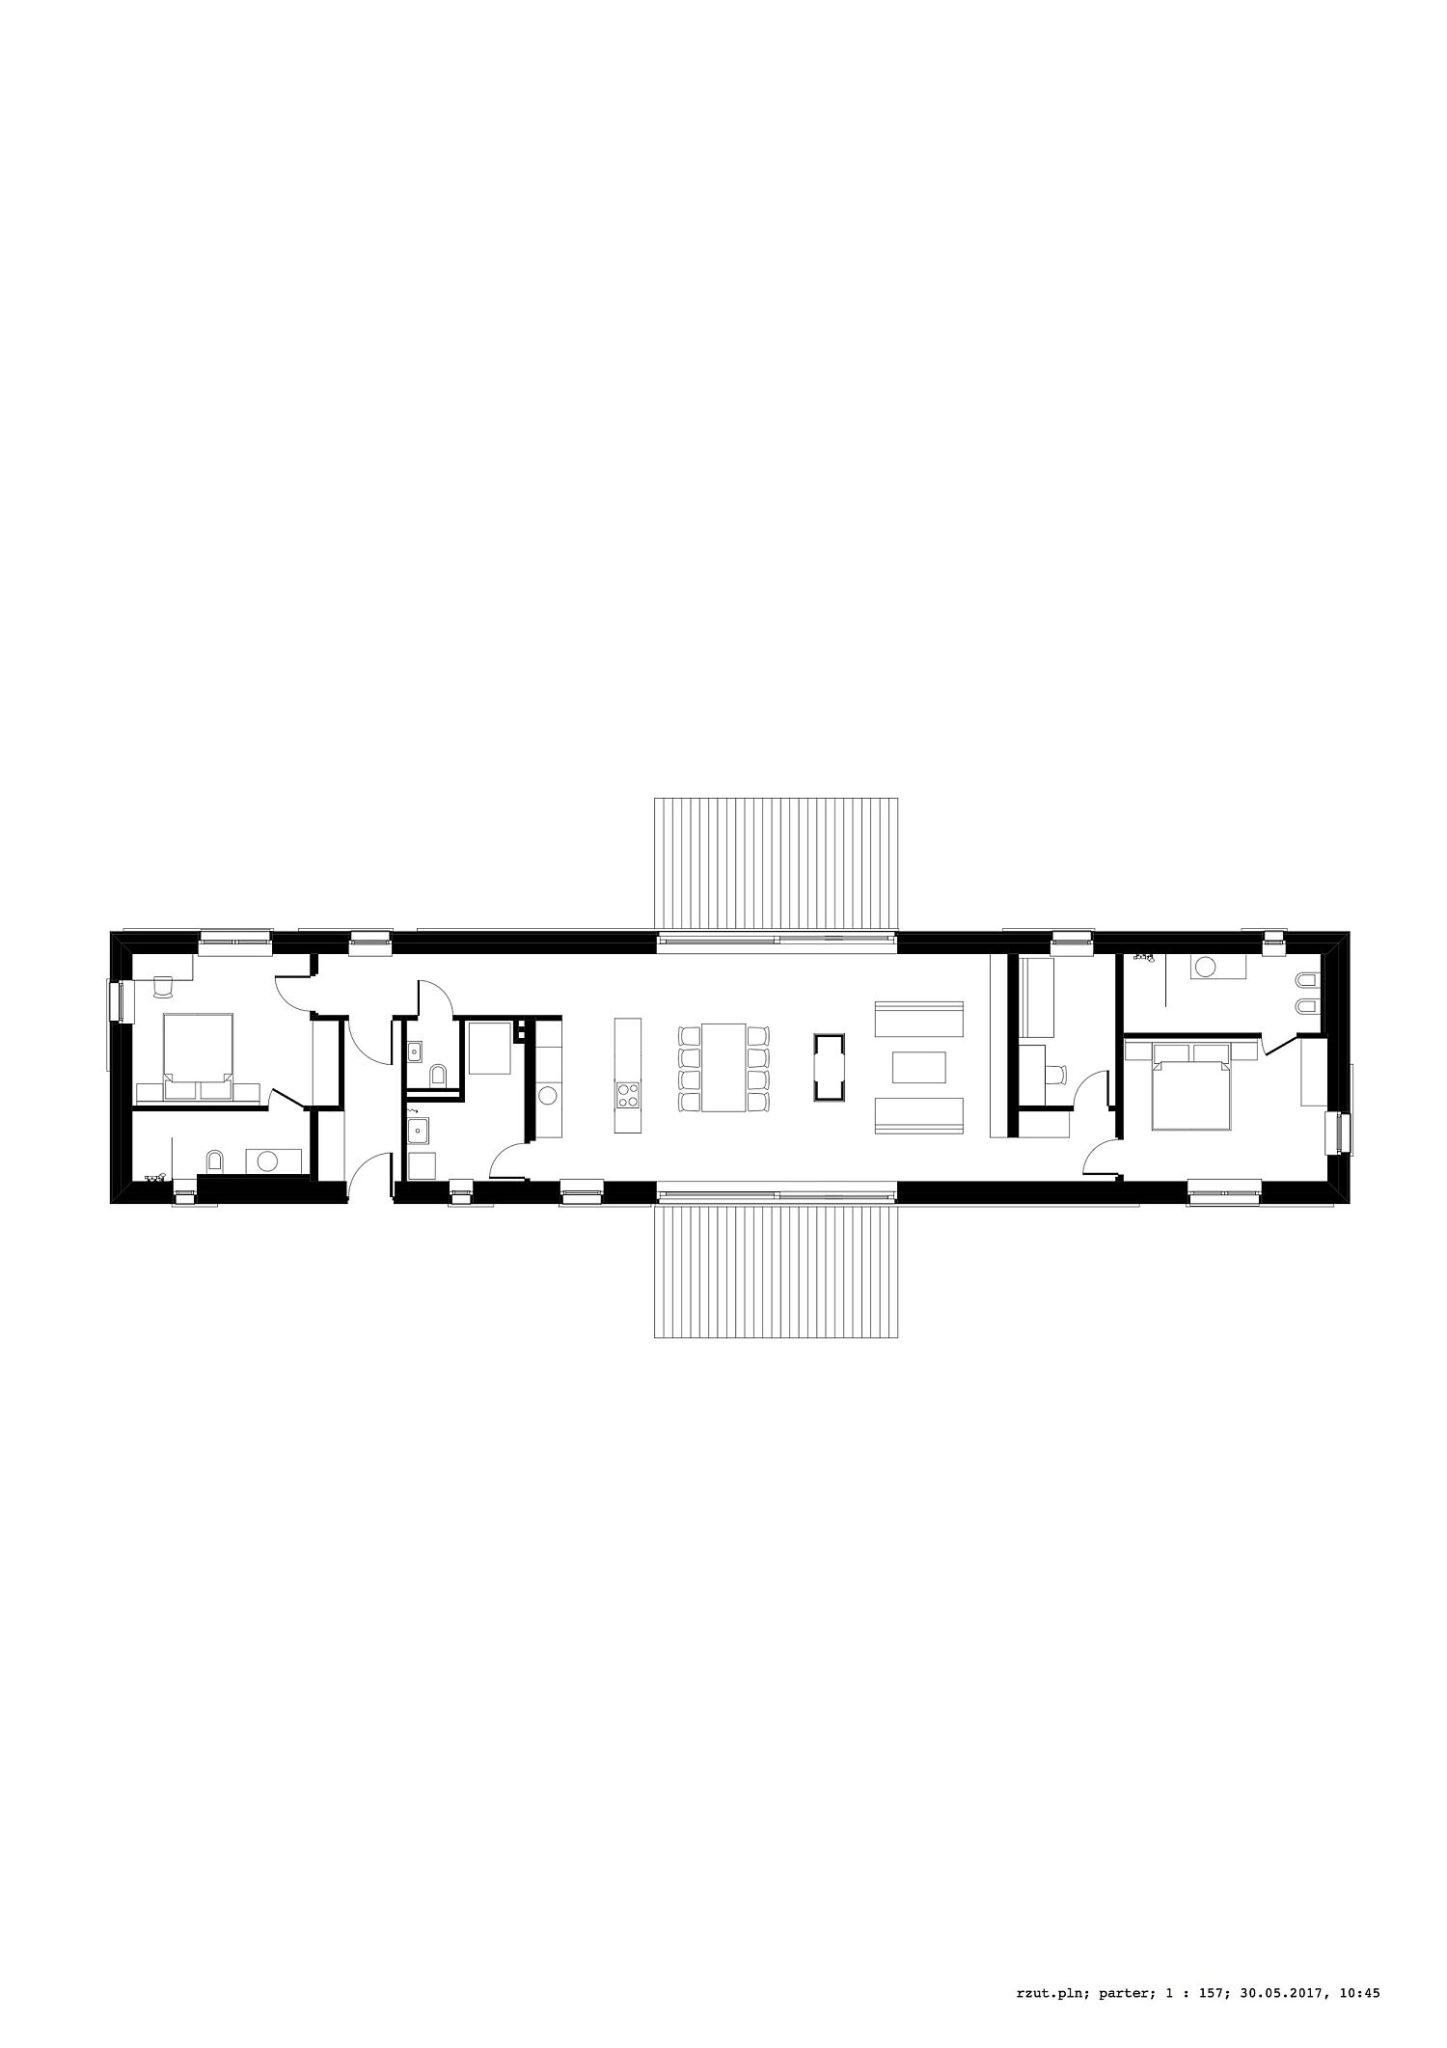 Floor-plan-of-House-01-in-Nowa-Górka-Poland